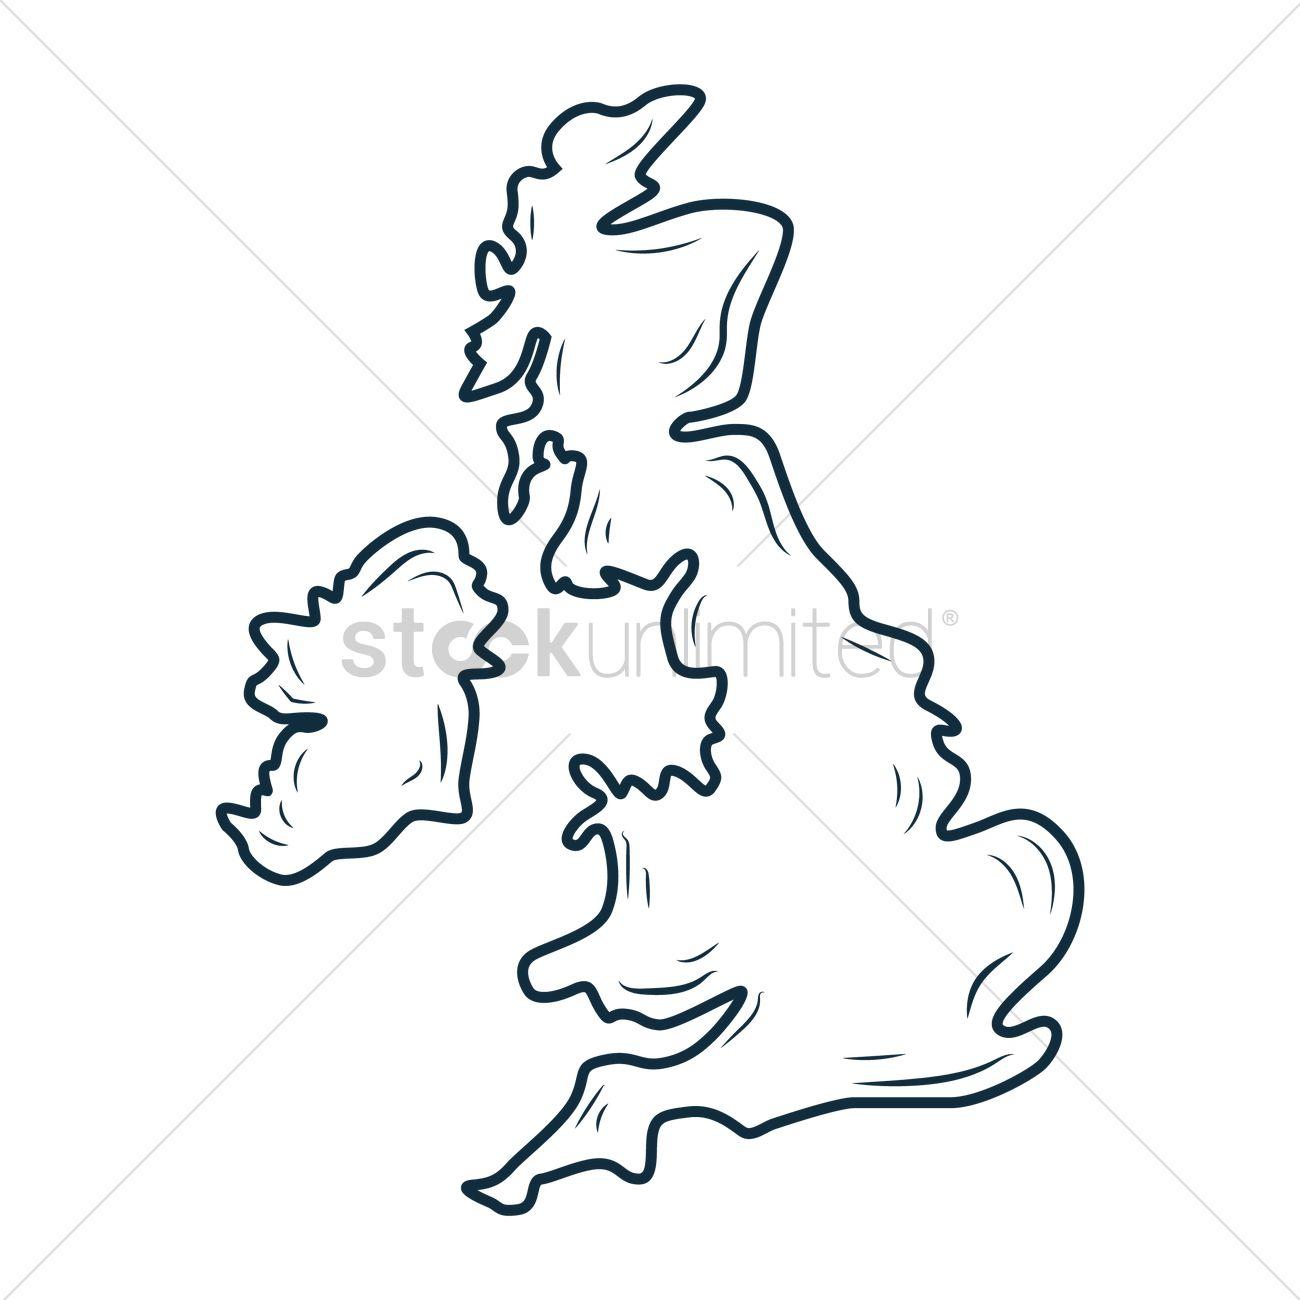 Line Drawing Uk : Free uk map vector image stockunlimited